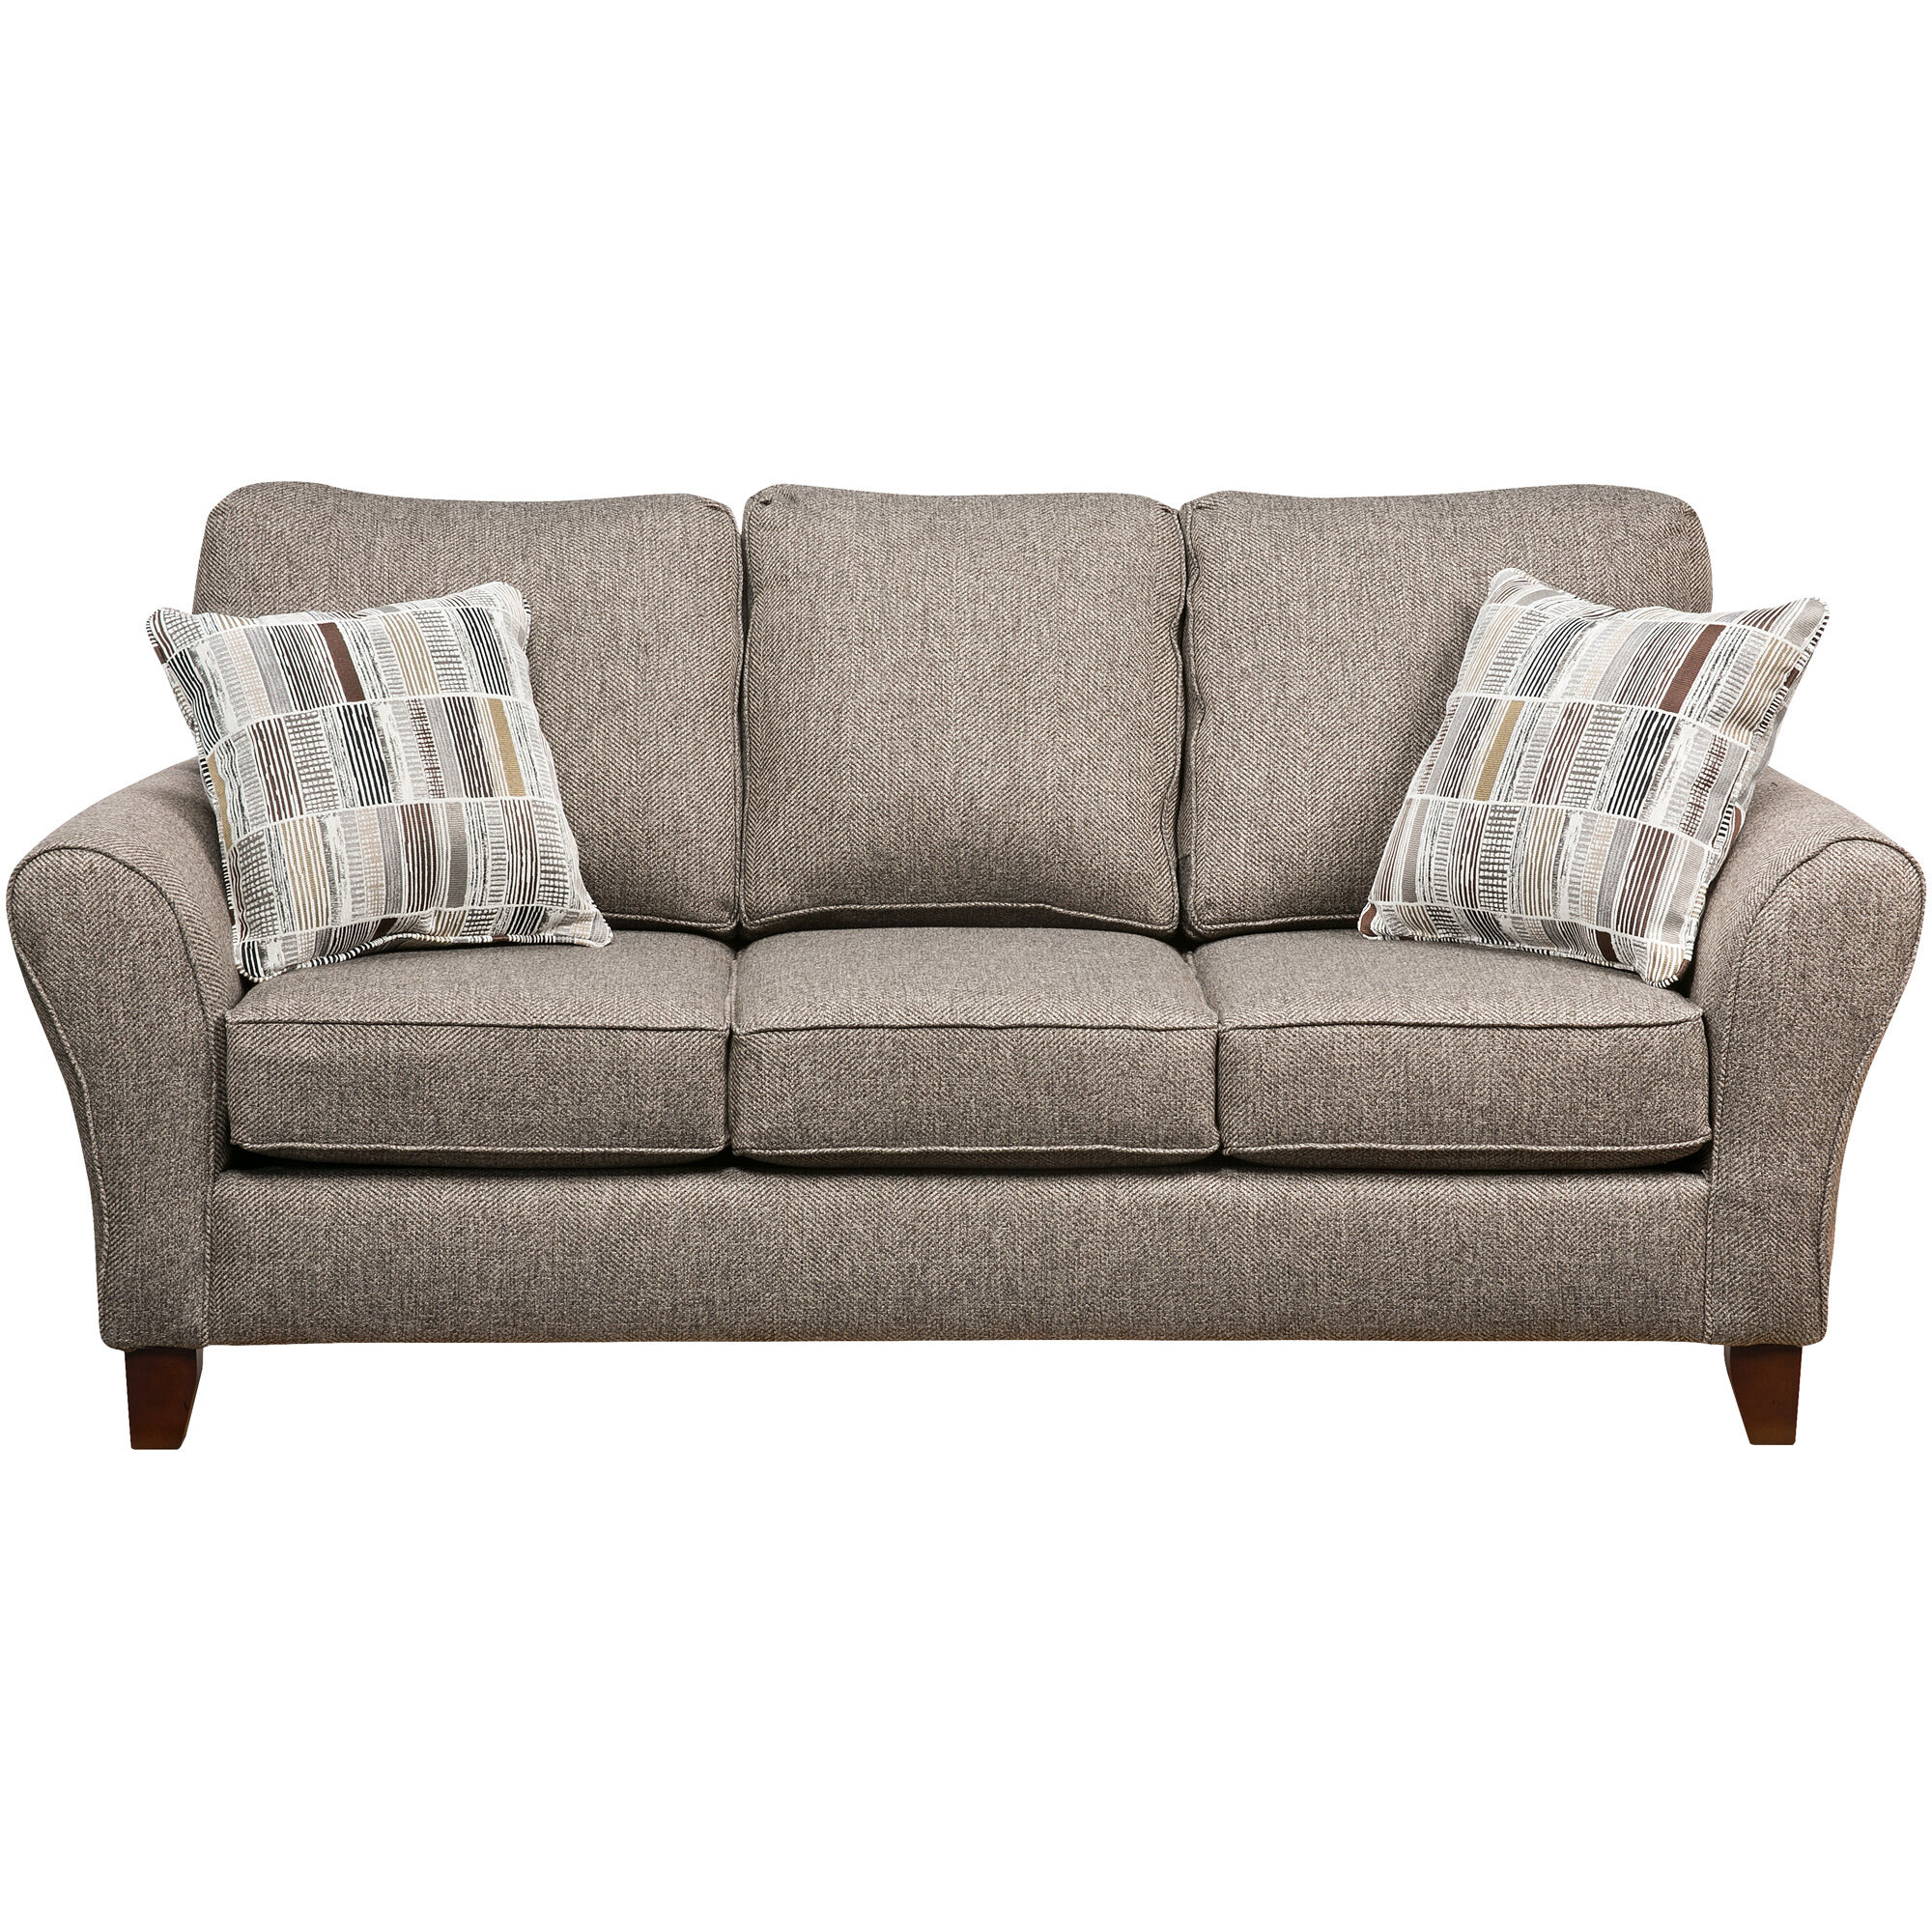 slumberland com sofas sure fit sofa cover uk furniture binsfield room group